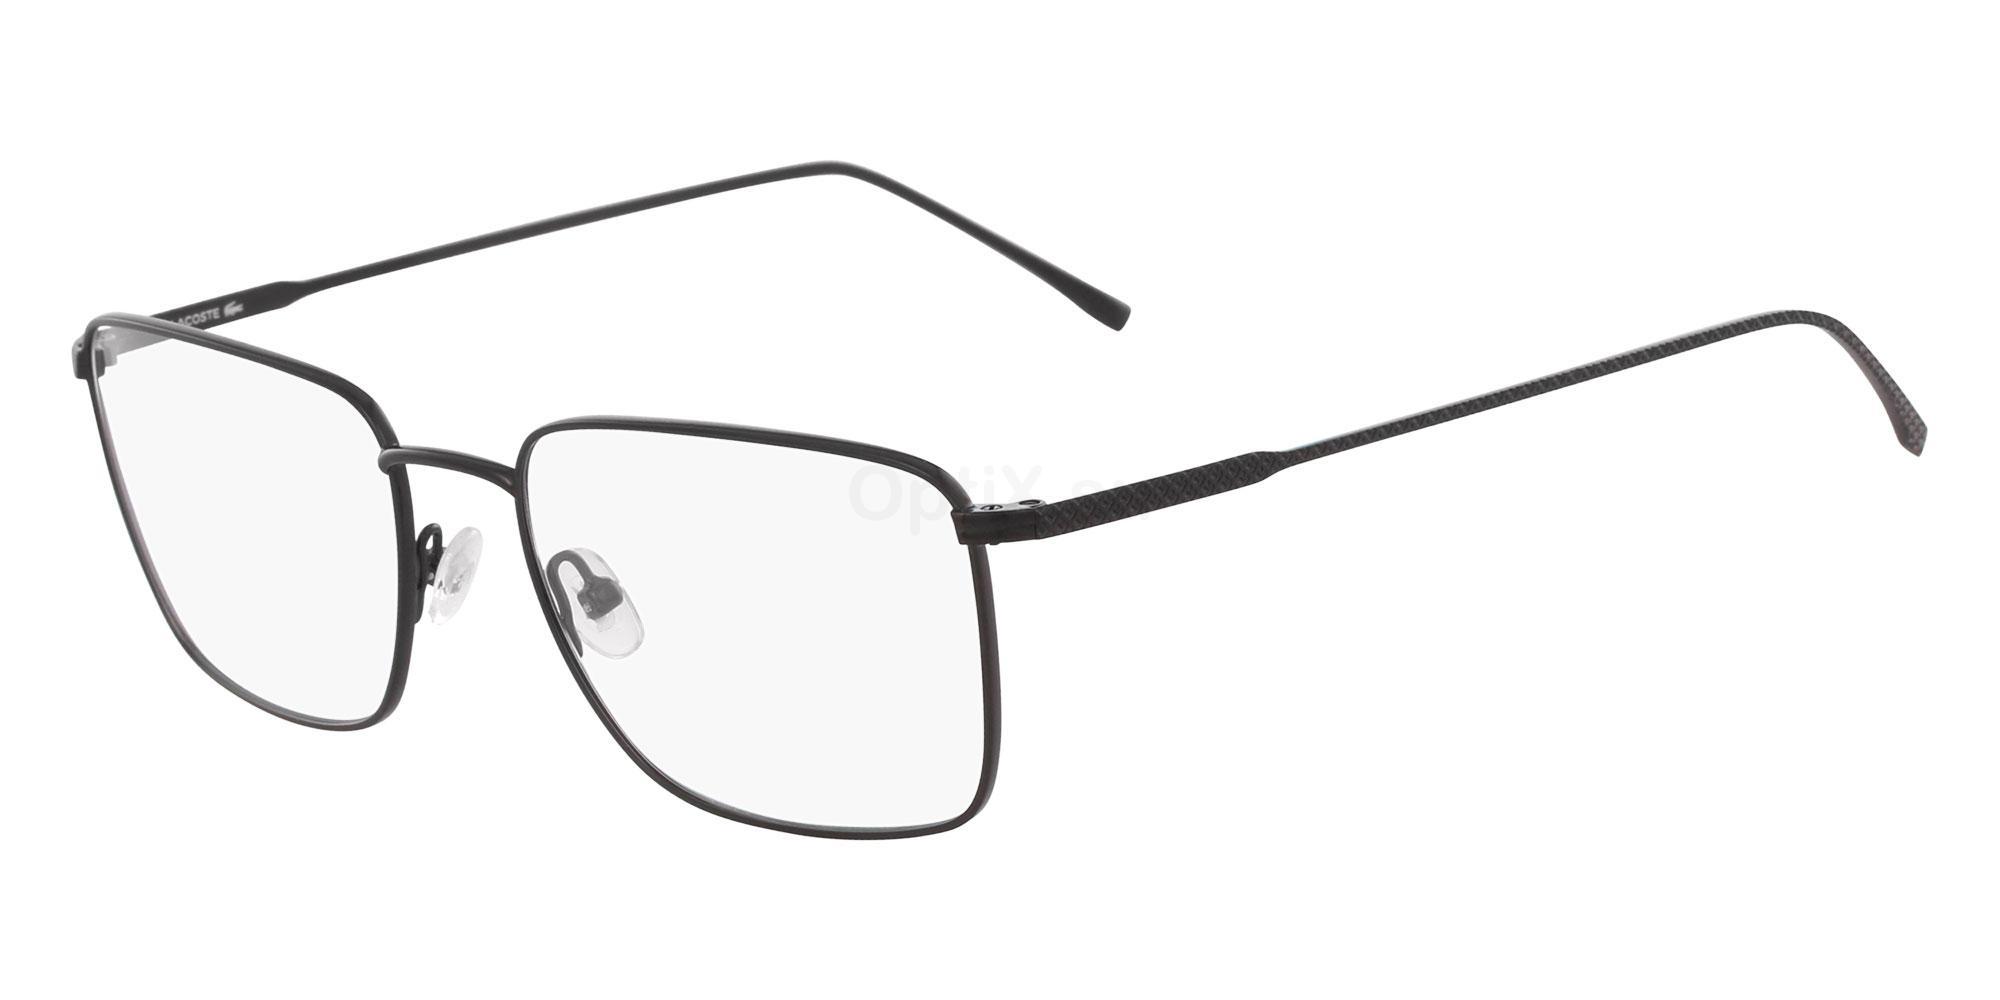 001 L2245 Glasses, Lacoste